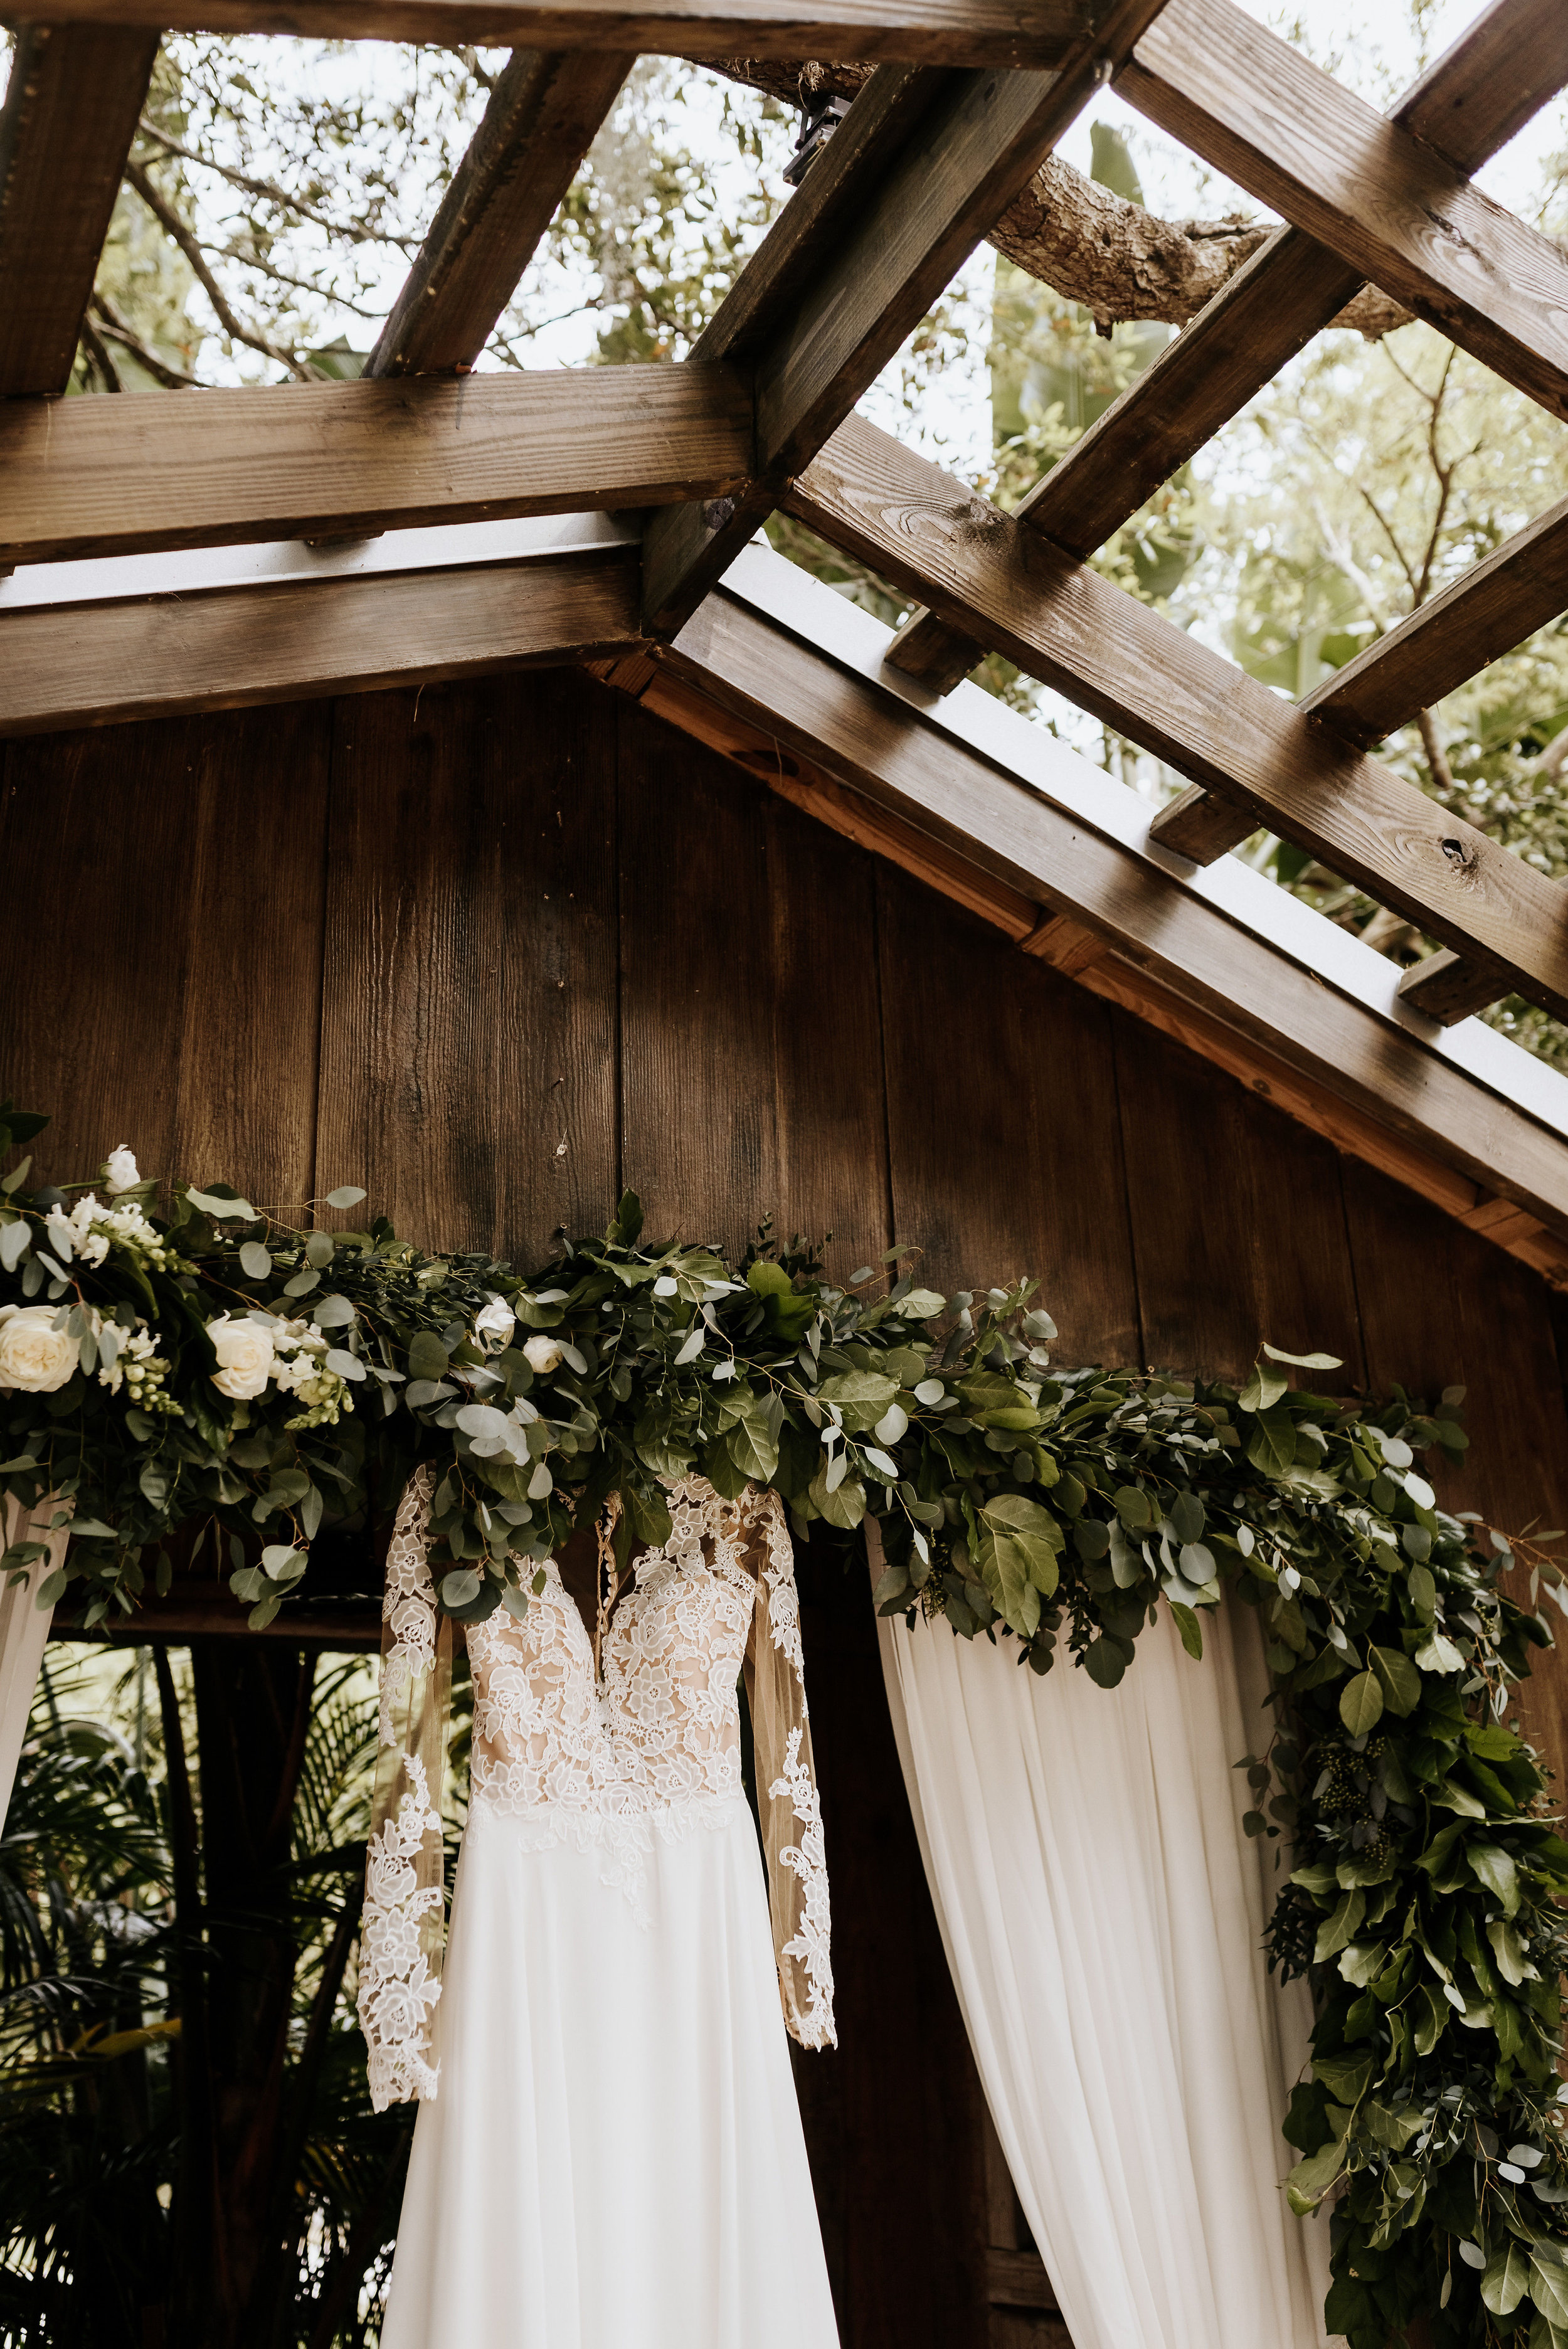 Mikenzi_Brad_Wedding_The_Delamater_House_New_Smyrna_Beach_Florida_Photography_by_V_9576.jpg